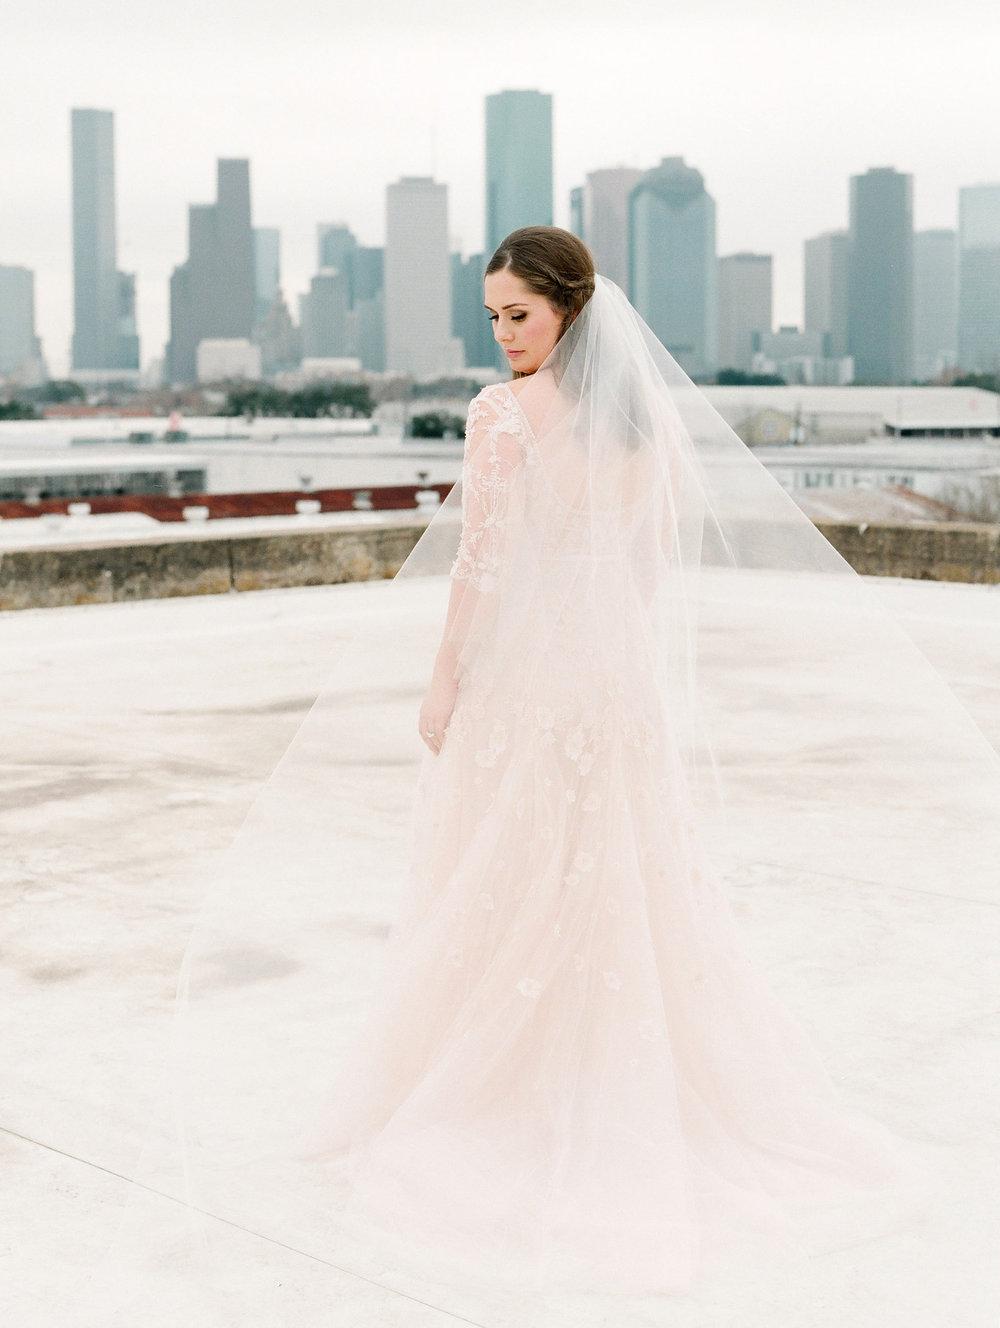 0051_0044_The-Astorian-Film-Bridal-Photographer.jpg